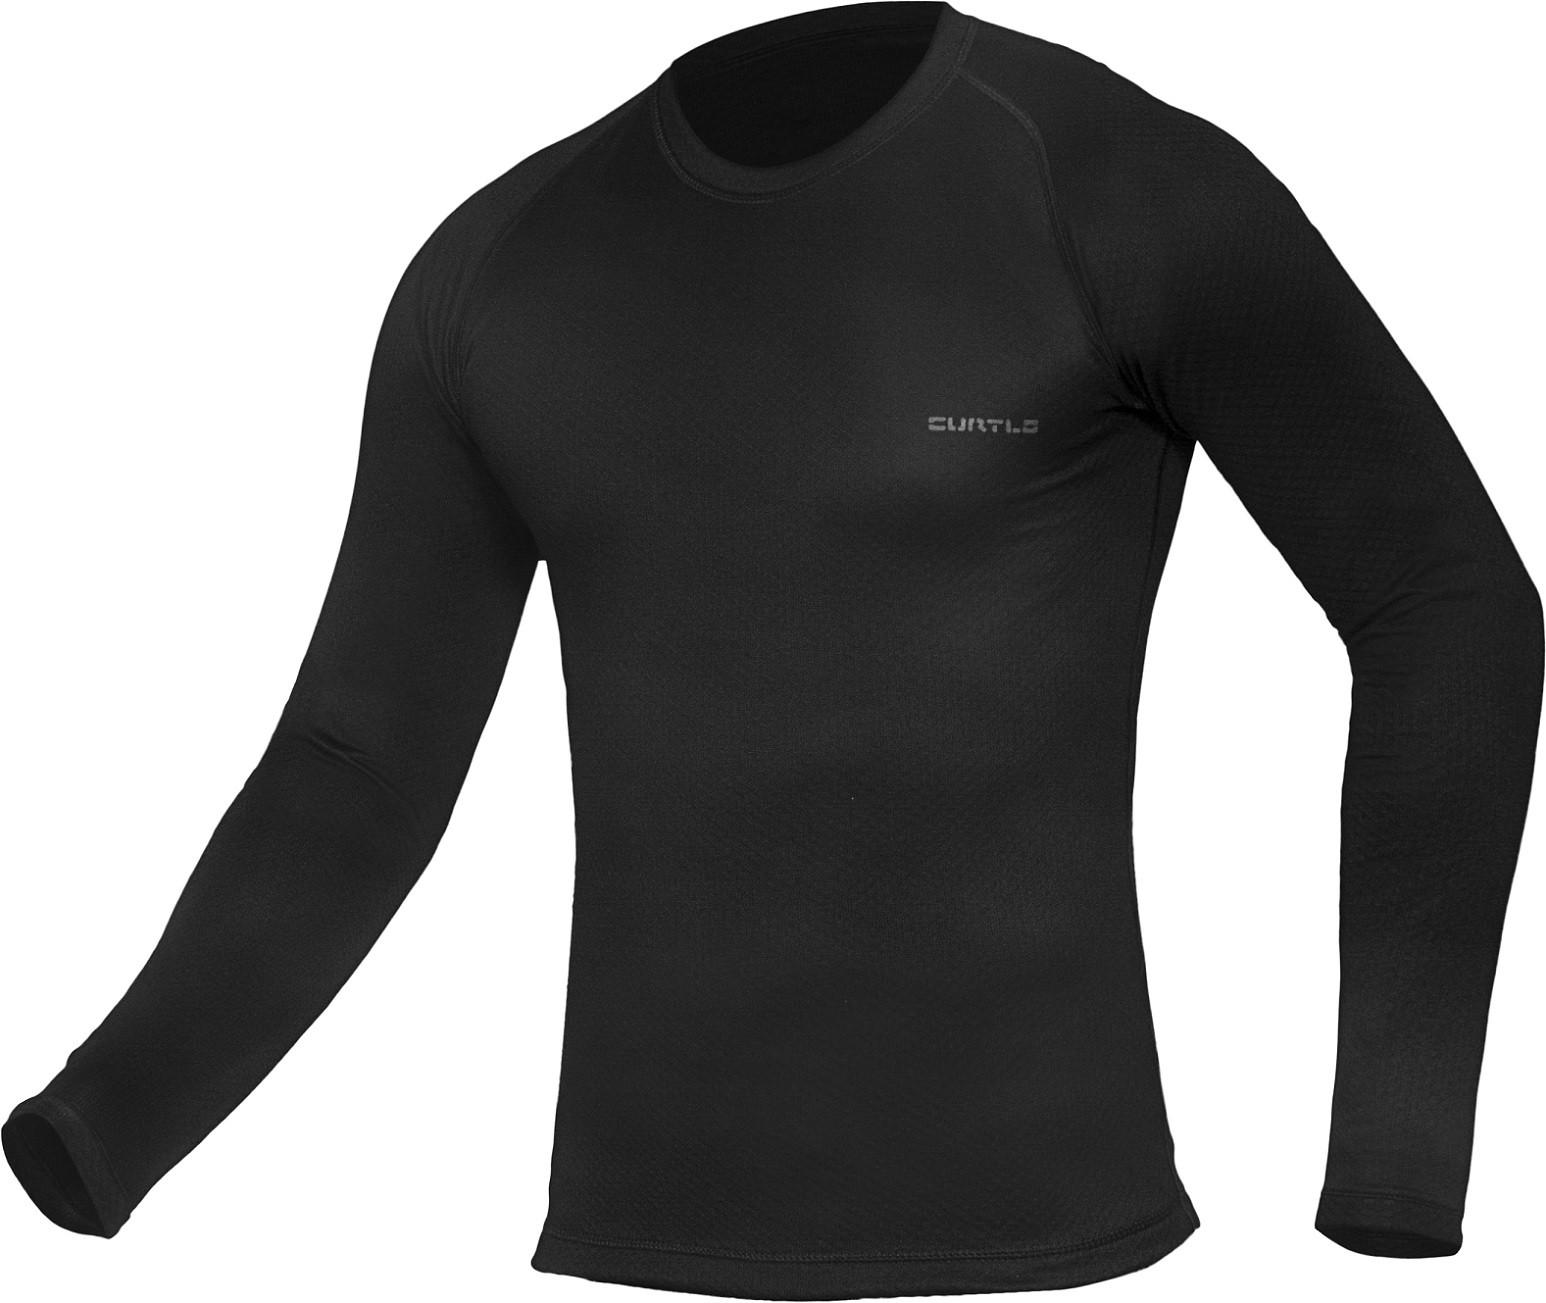 Blusa/ Camiseta Segunda Pele Manga Longa T-Shirt ThermoSkin ML Masculina Curtlo